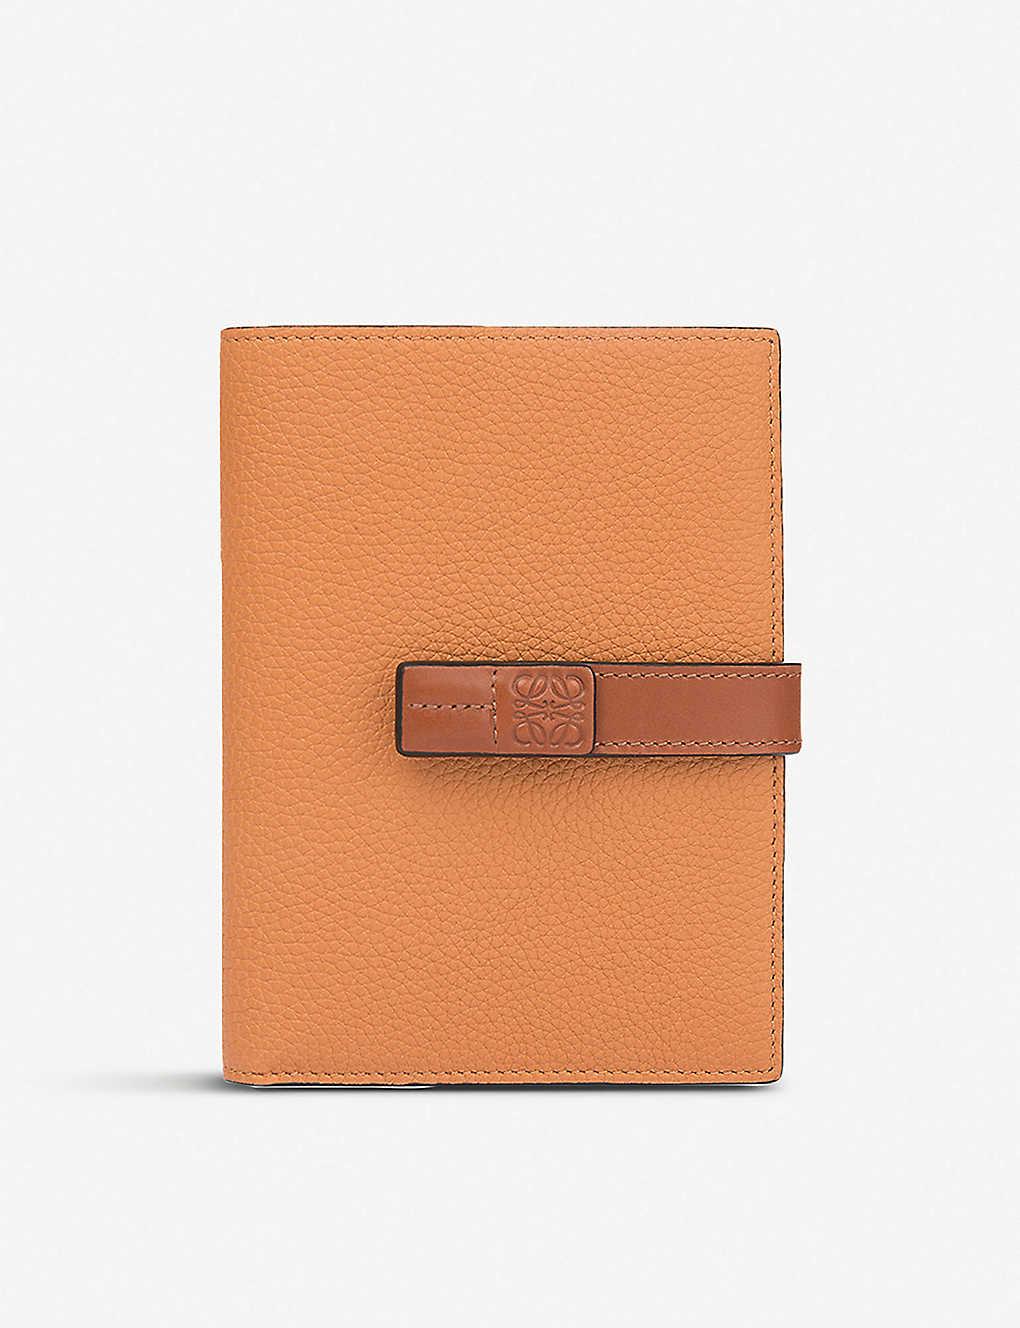 Loewe Medium Vertical Grained-leather Wallet In Light Caramel/pecan